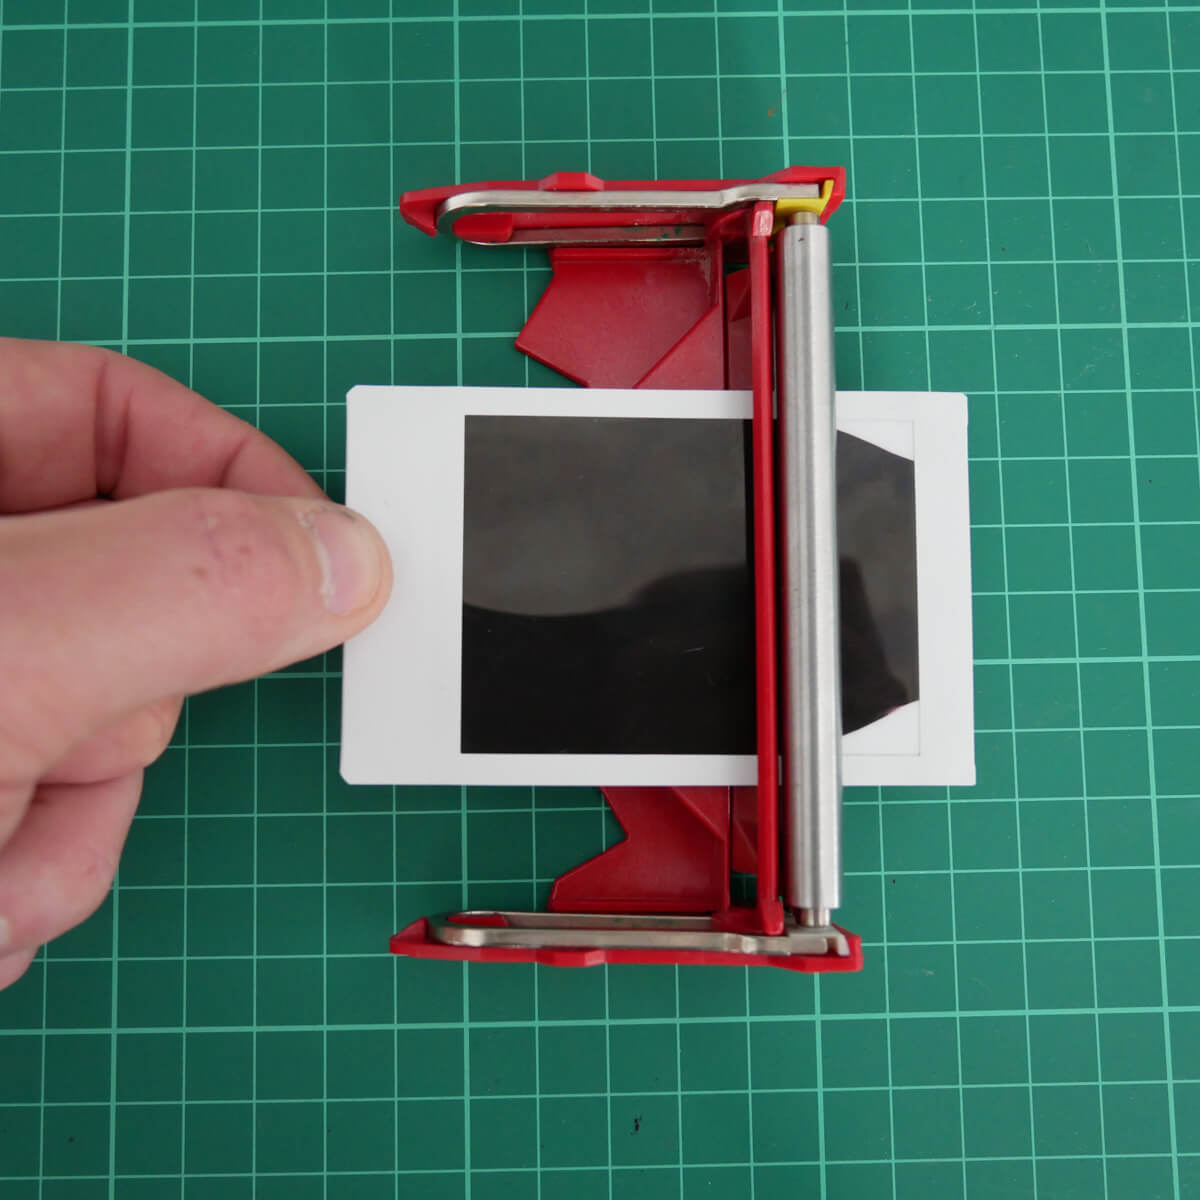 Pull - Fujifilm Instax Mini in a 35mm camera